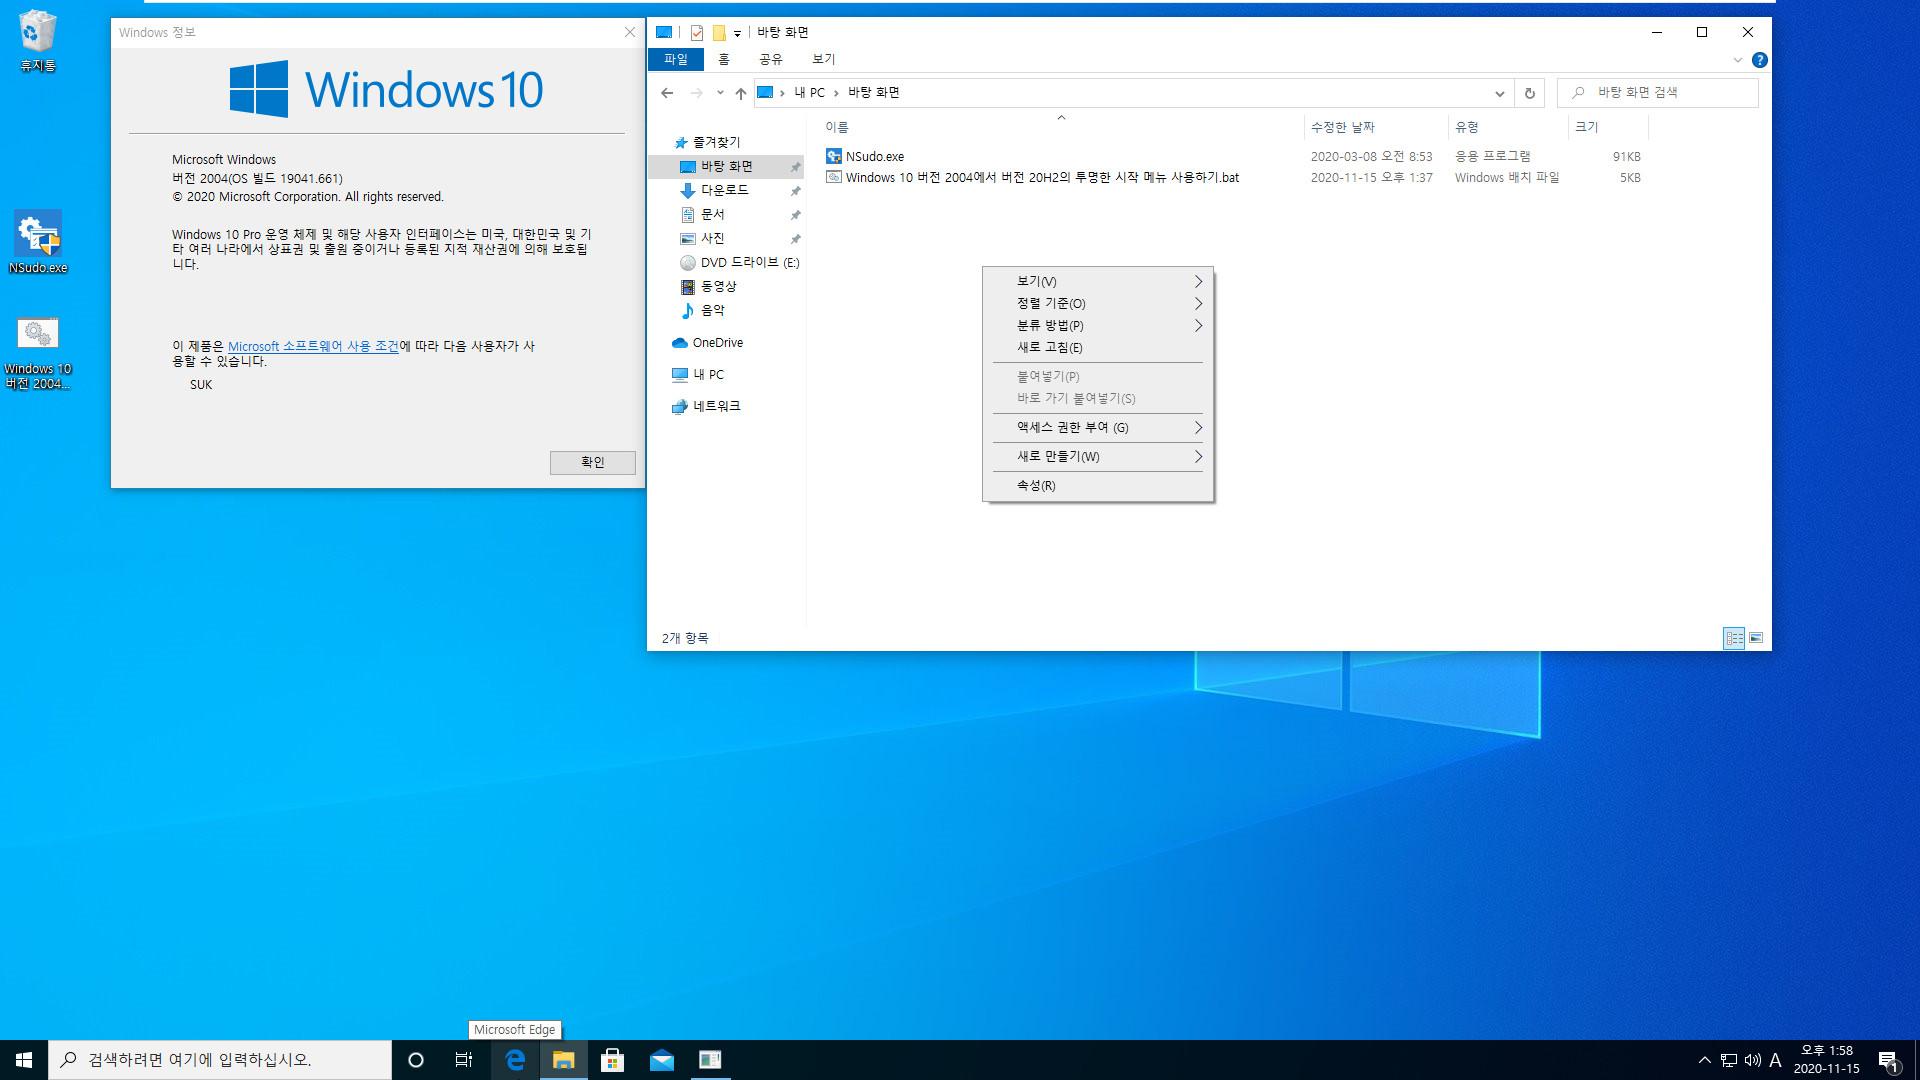 Windows 10 버전 2004에서 버전 20H2의 투명한 시작 메뉴 사용하기.bat 테스트 2020-11-15_135826.jpg